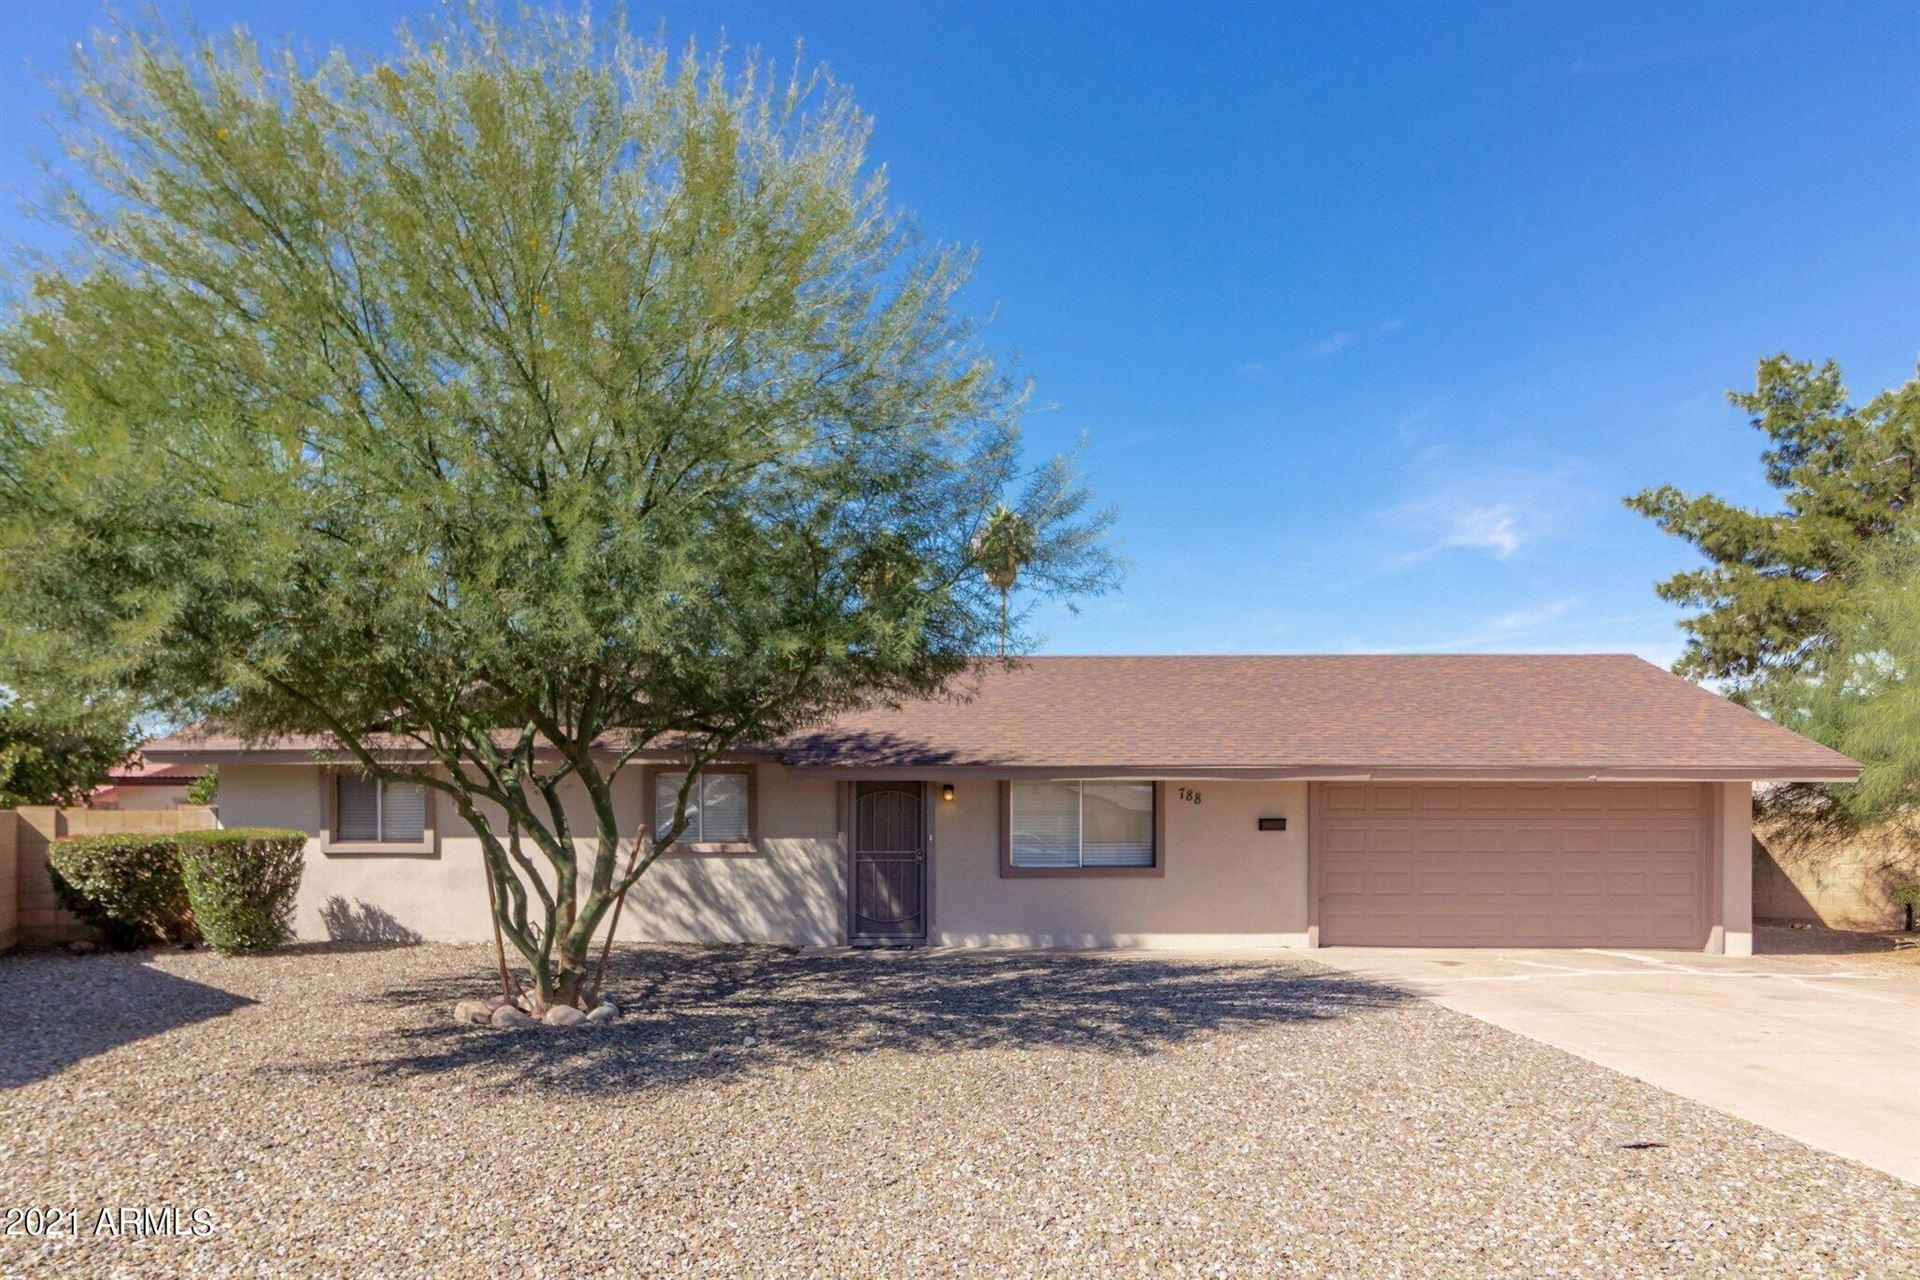 Photo of 788 N Pleasant Drive, Chandler, AZ 85225 (MLS # 6310878)